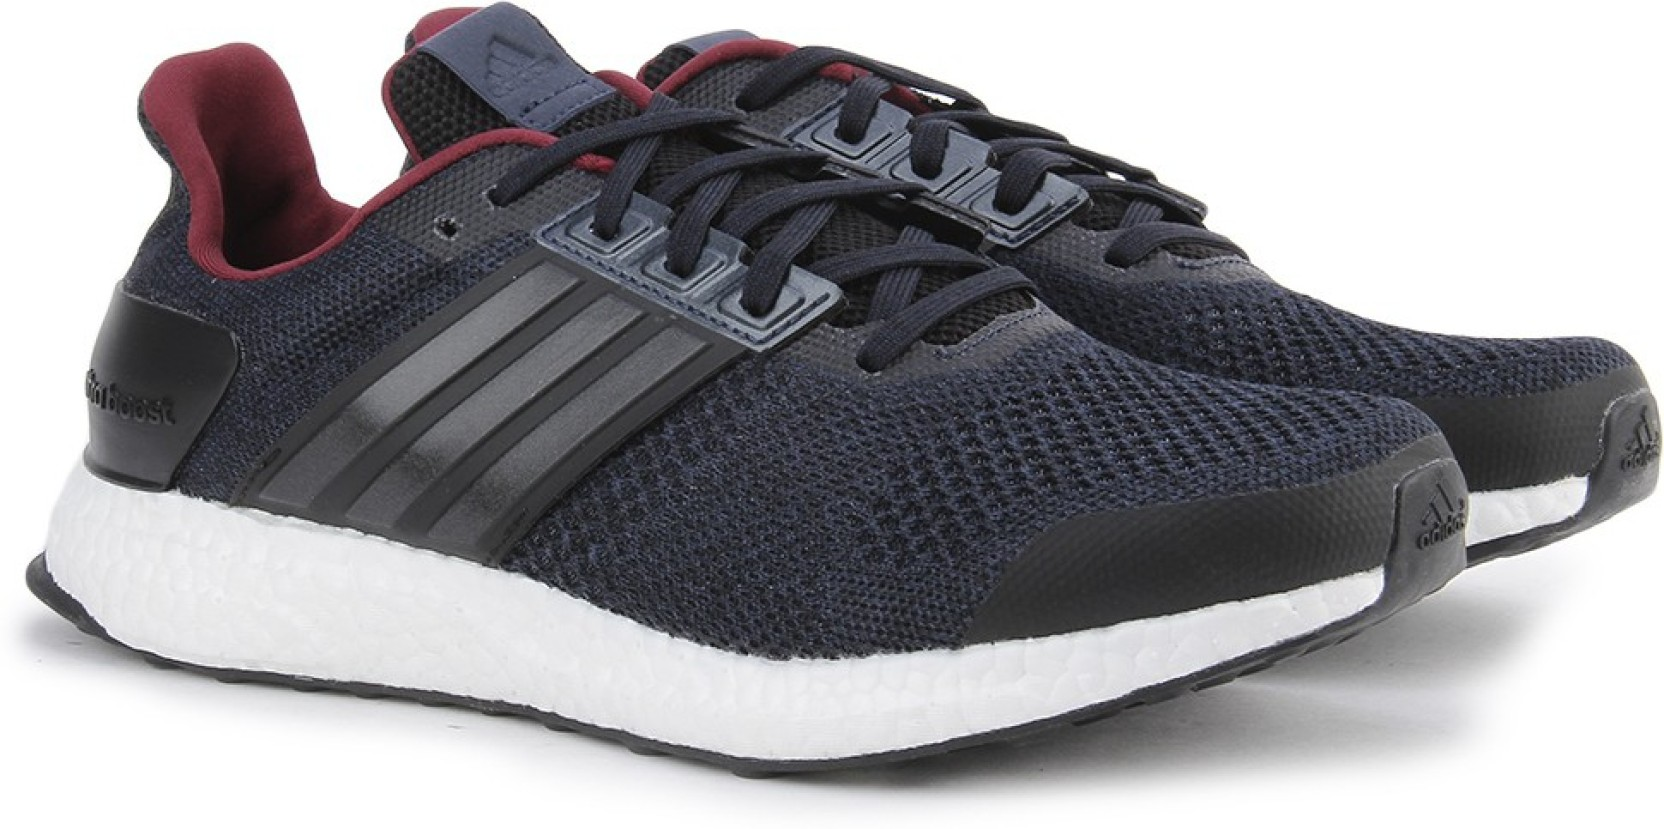 b5740cb84 ADIDAS ULTRA BOOST ST M Running Shoes For Men - Buy CBLACK CBLACK ...